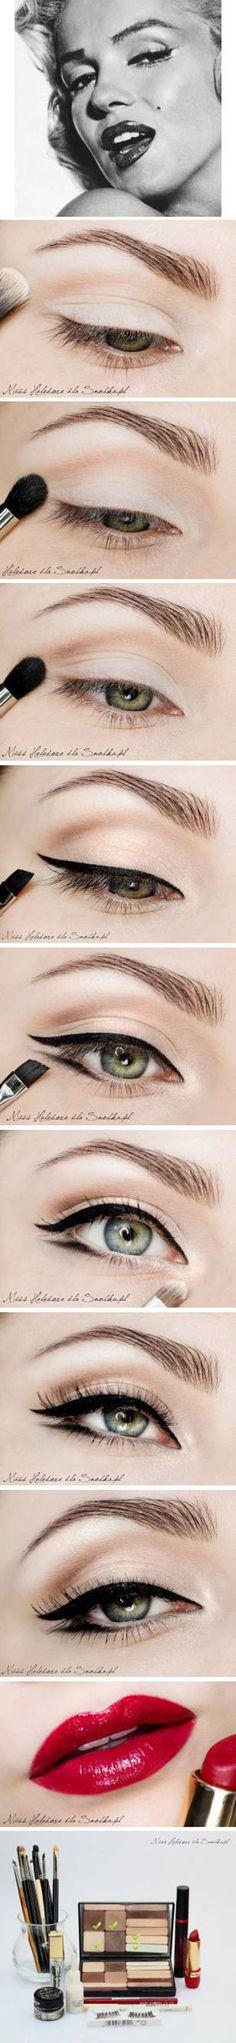 Gorgeous Double Wing Eye Shadow Tutorial #makeup #eyeshadow